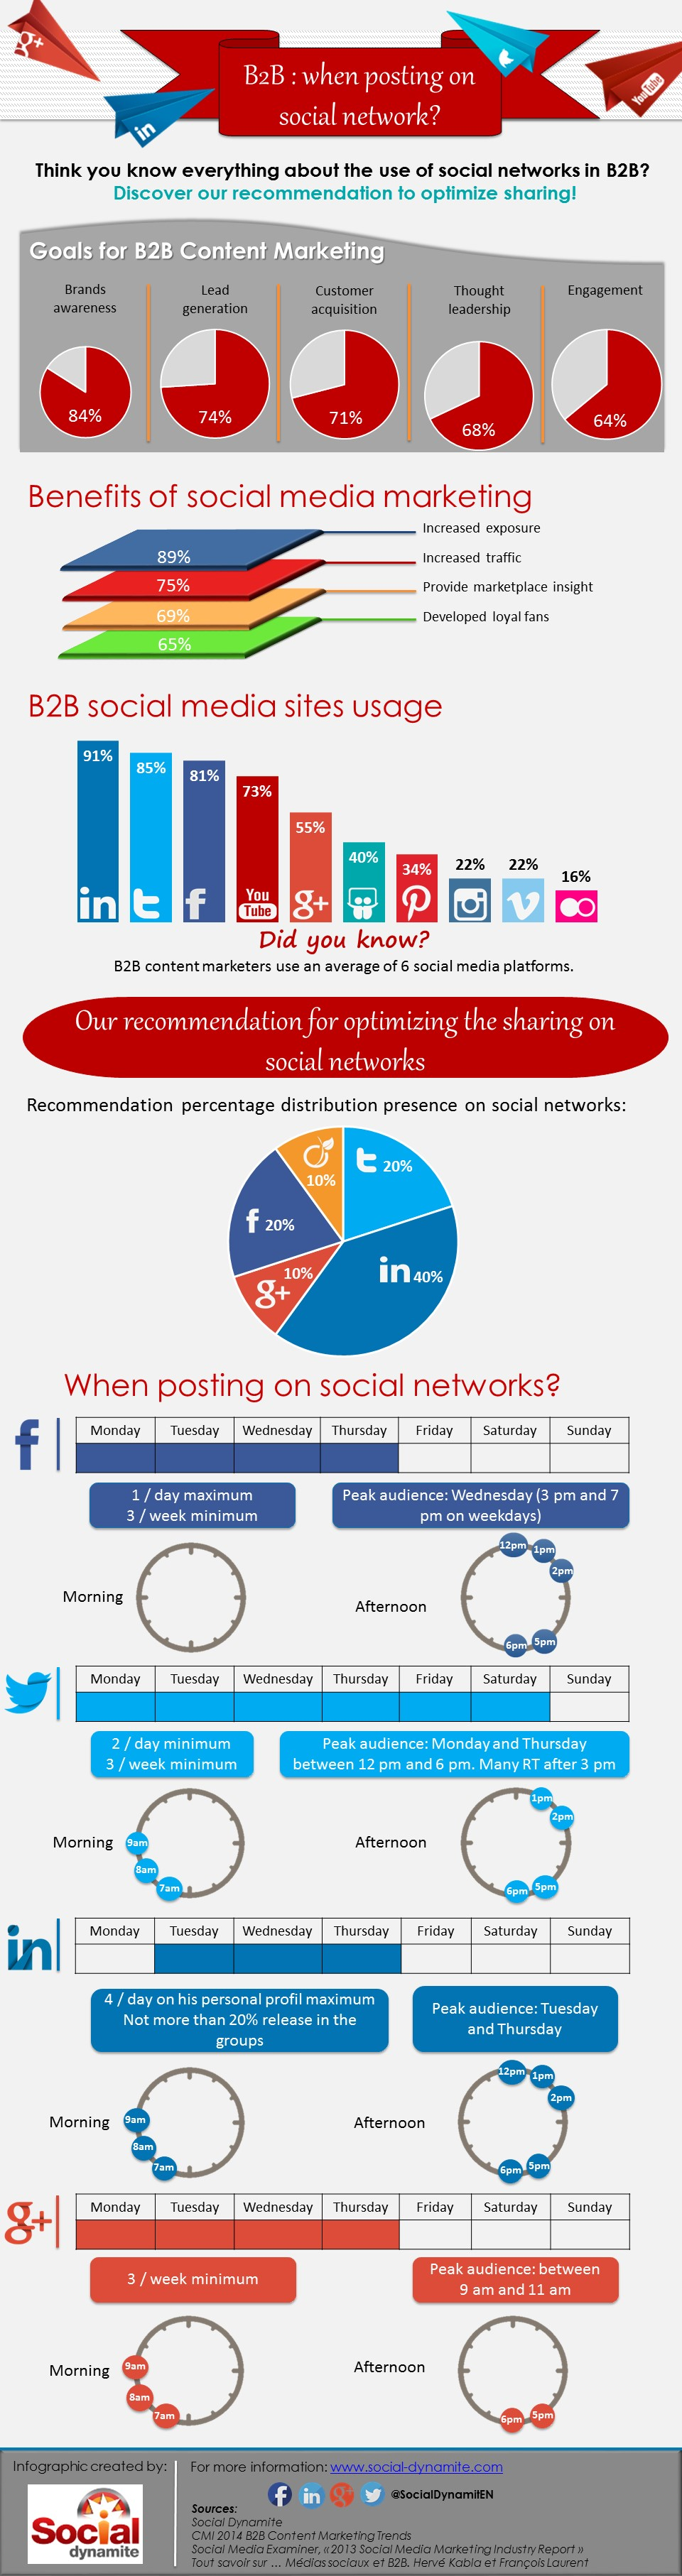 Infographic B2B social media